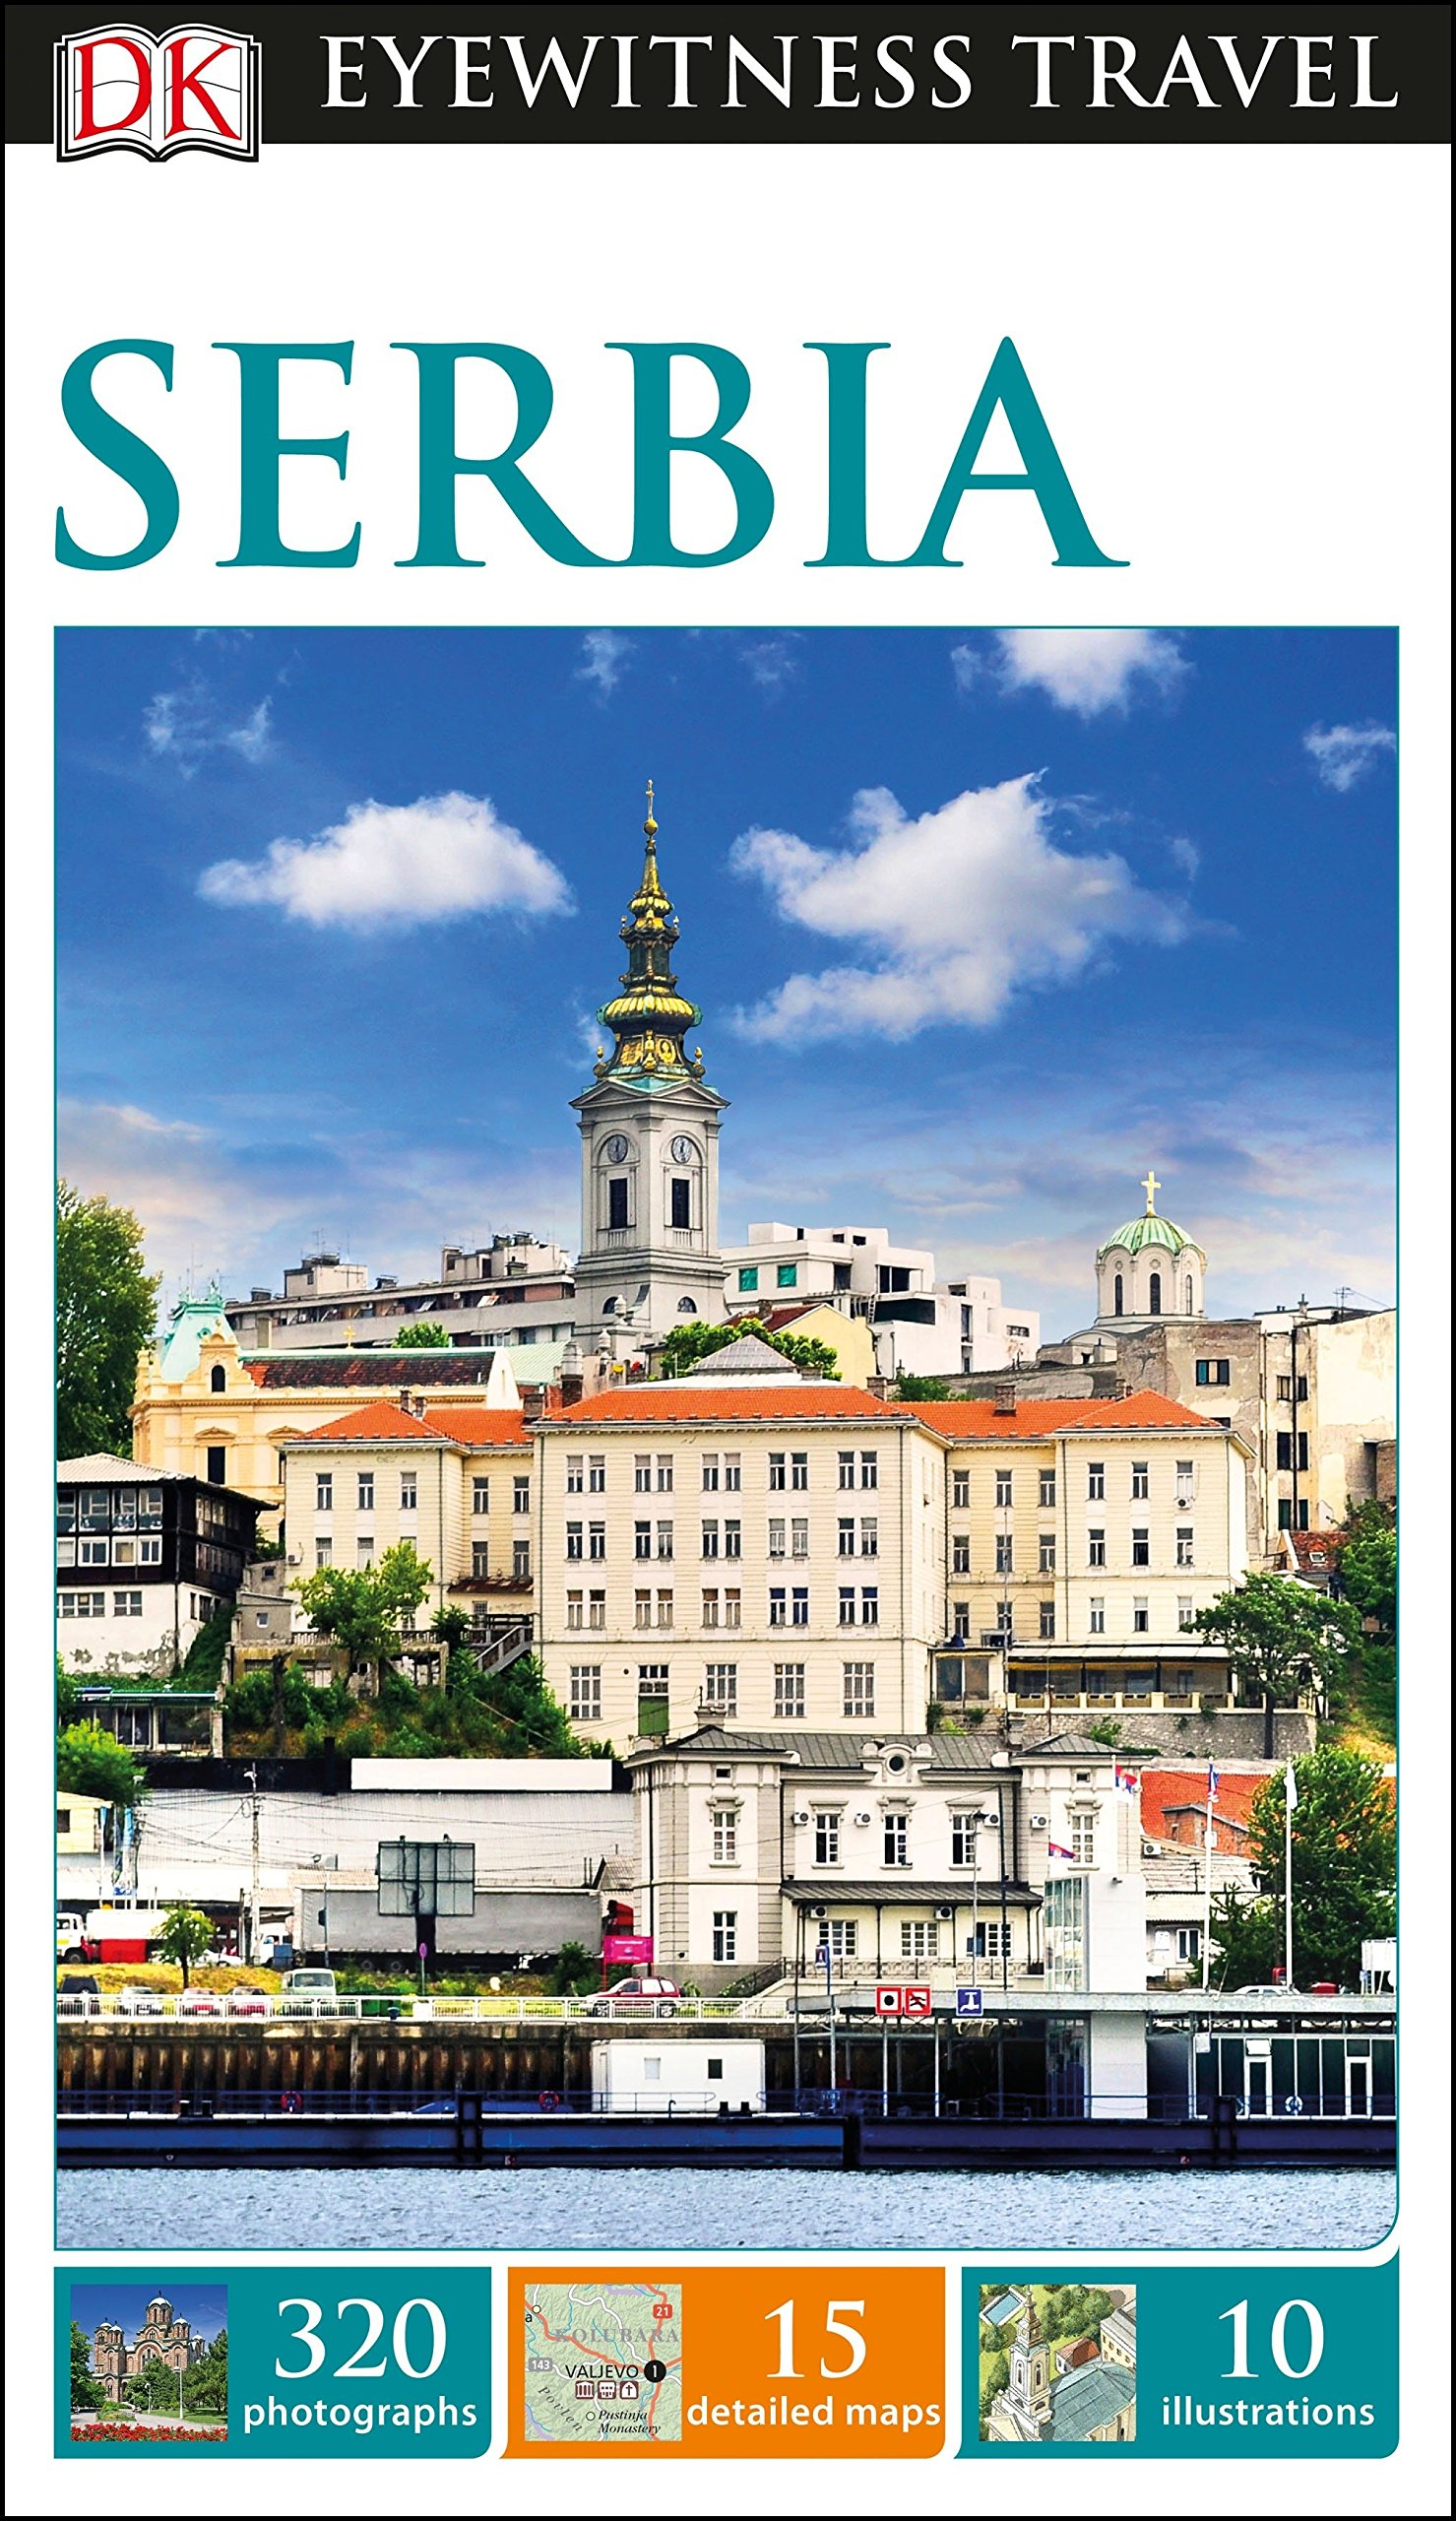 DK Eyewitness Travel Guide Serbia product image